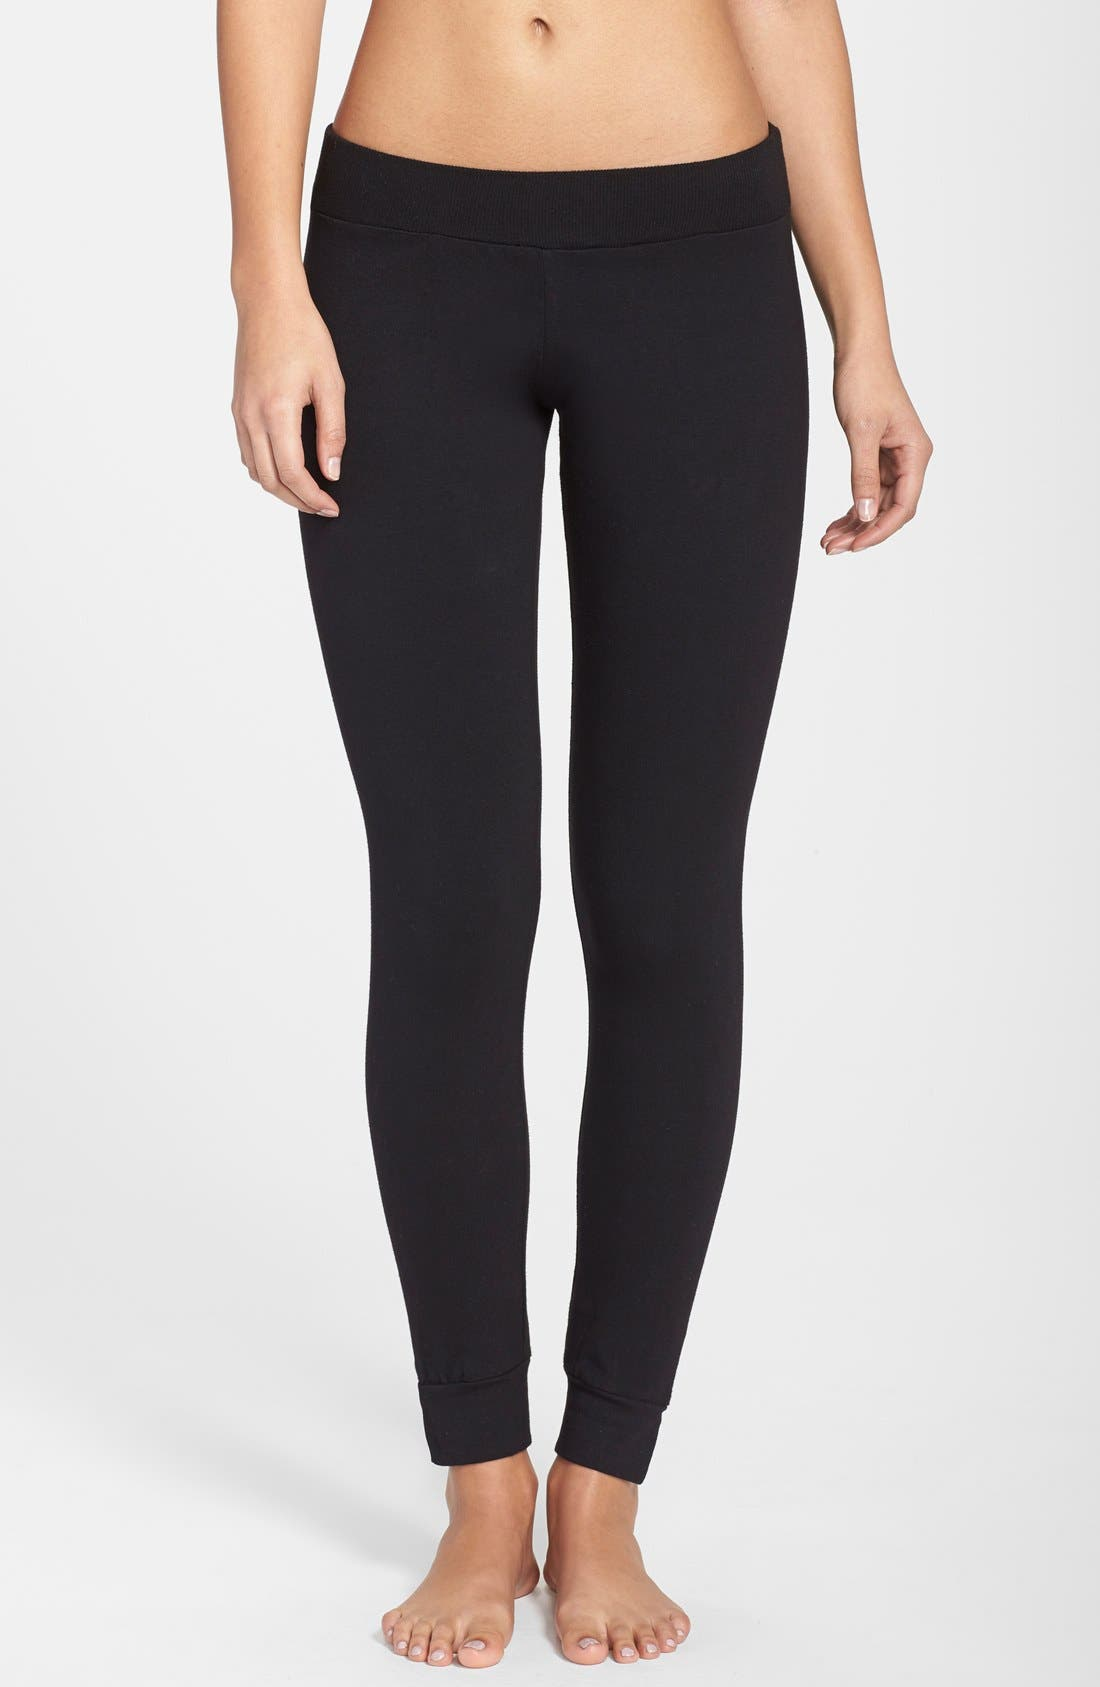 MONROW Yoga Leggings, Main, color, 001